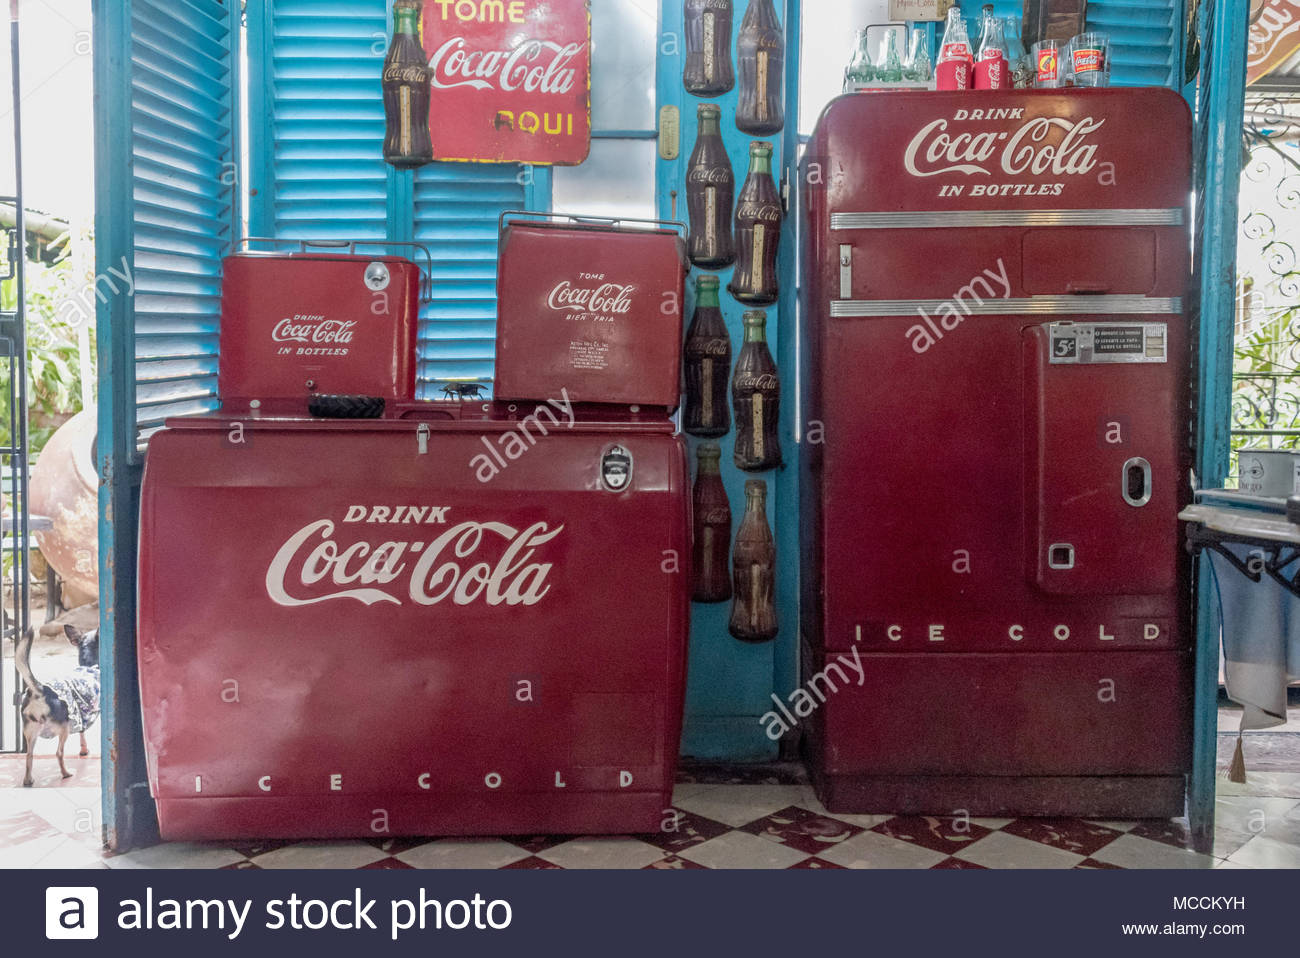 Kühlschrank Coca Cola : Alte coca cola kühlschrank bei ileana sanchez und joel jover haus